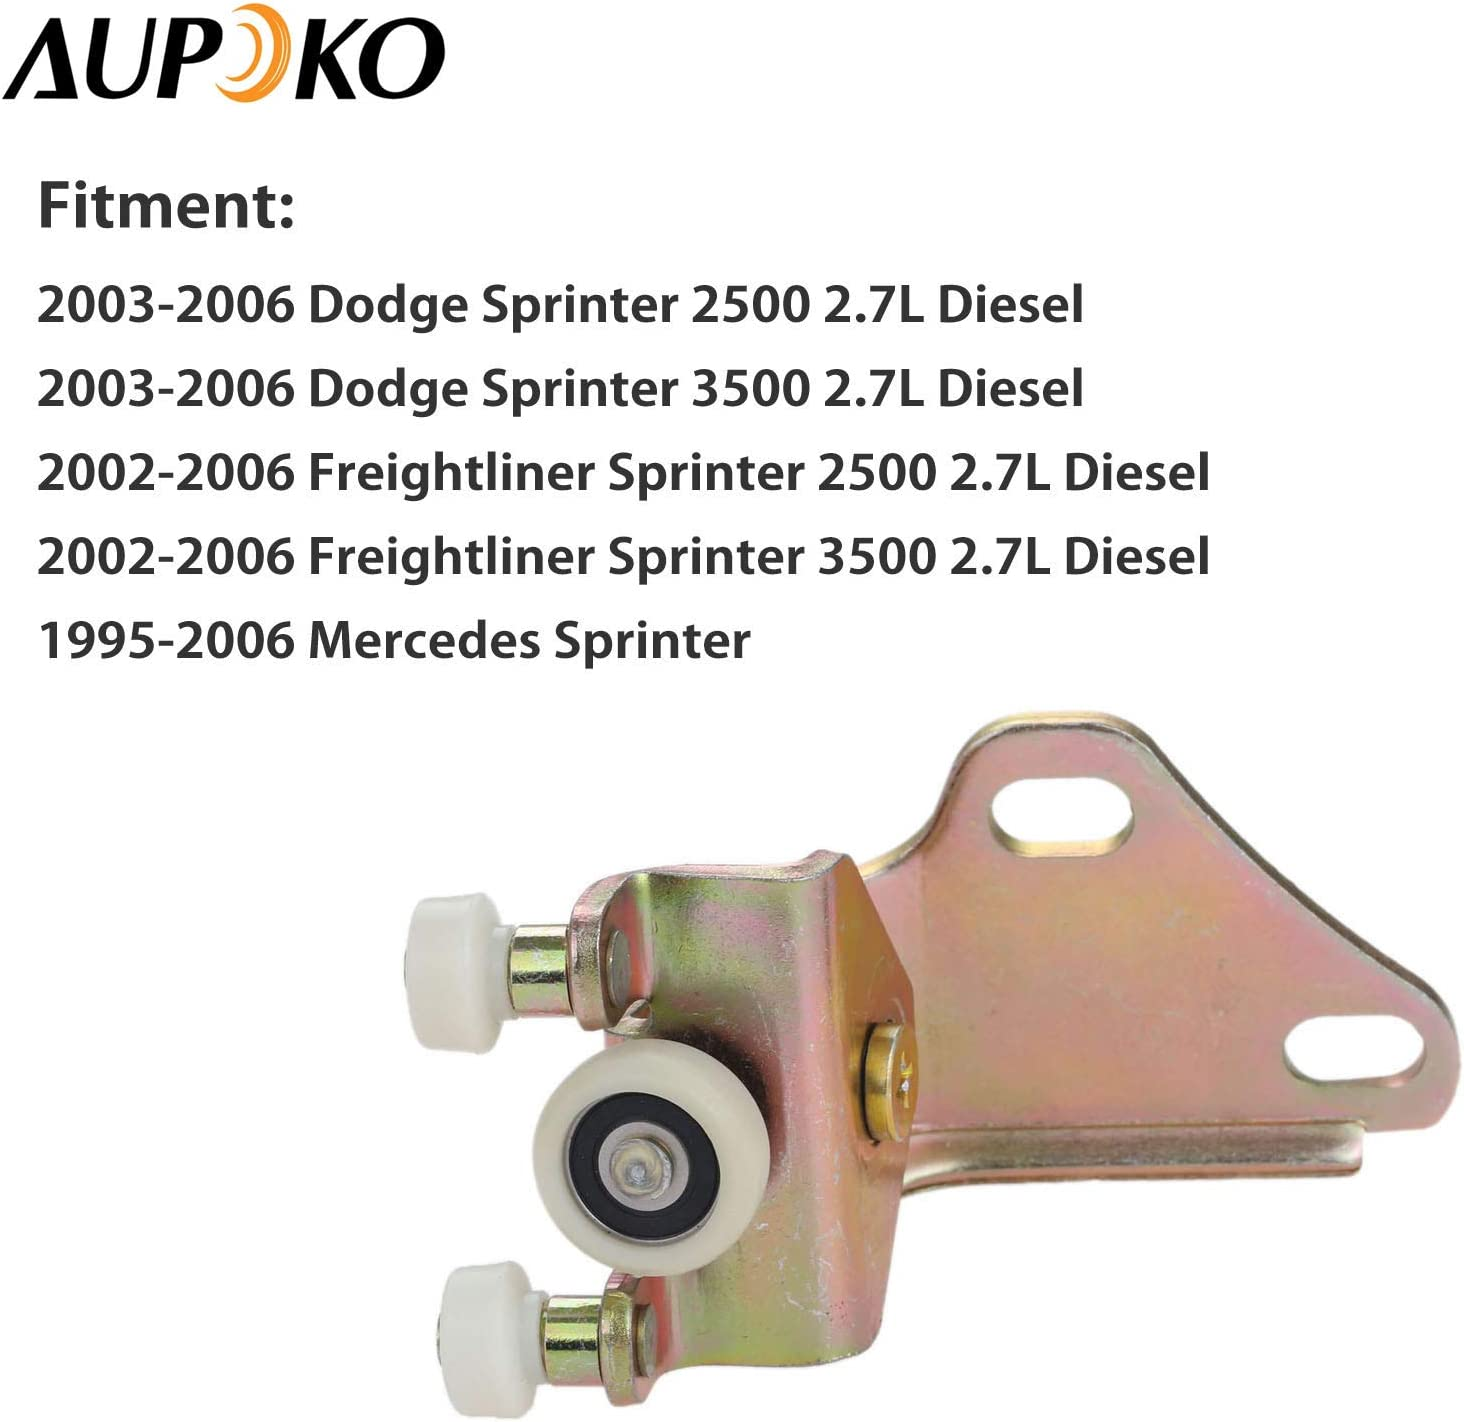 Aupoko 9017600128 Lower Right Rear Sliding Door Roller Sliding Side Door Roller Assembly Replace# 2D1843398A Fits for Dodge Freightliner Mercedes Sprinter 2D1843398 5103588AA